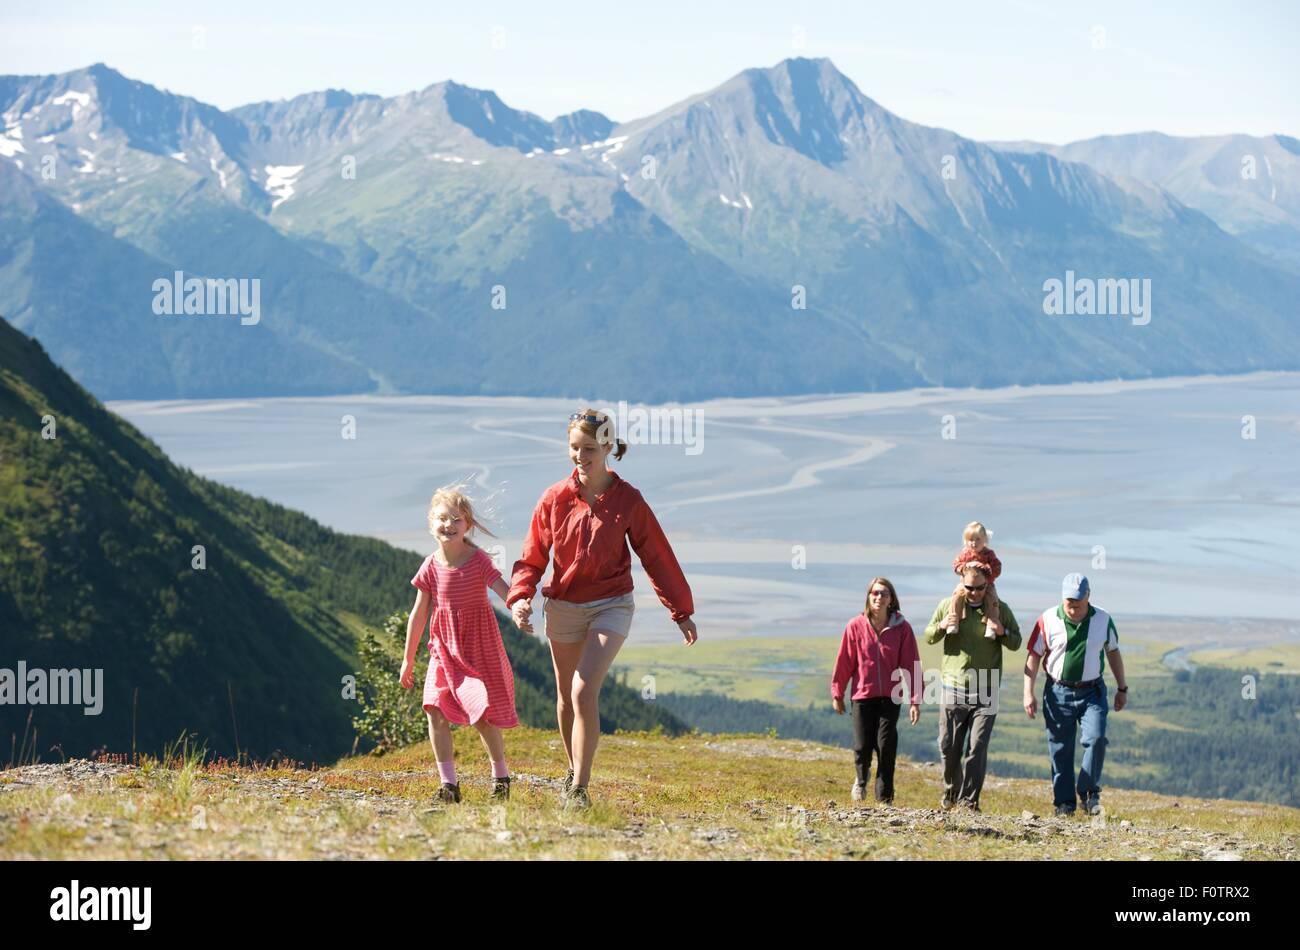 Group of people hiking, Mighty Might Trail, Alyeska Resort, Turnagain Arm, Mt. Alyeska, Girdwood, Alaska, USA - Stock Image